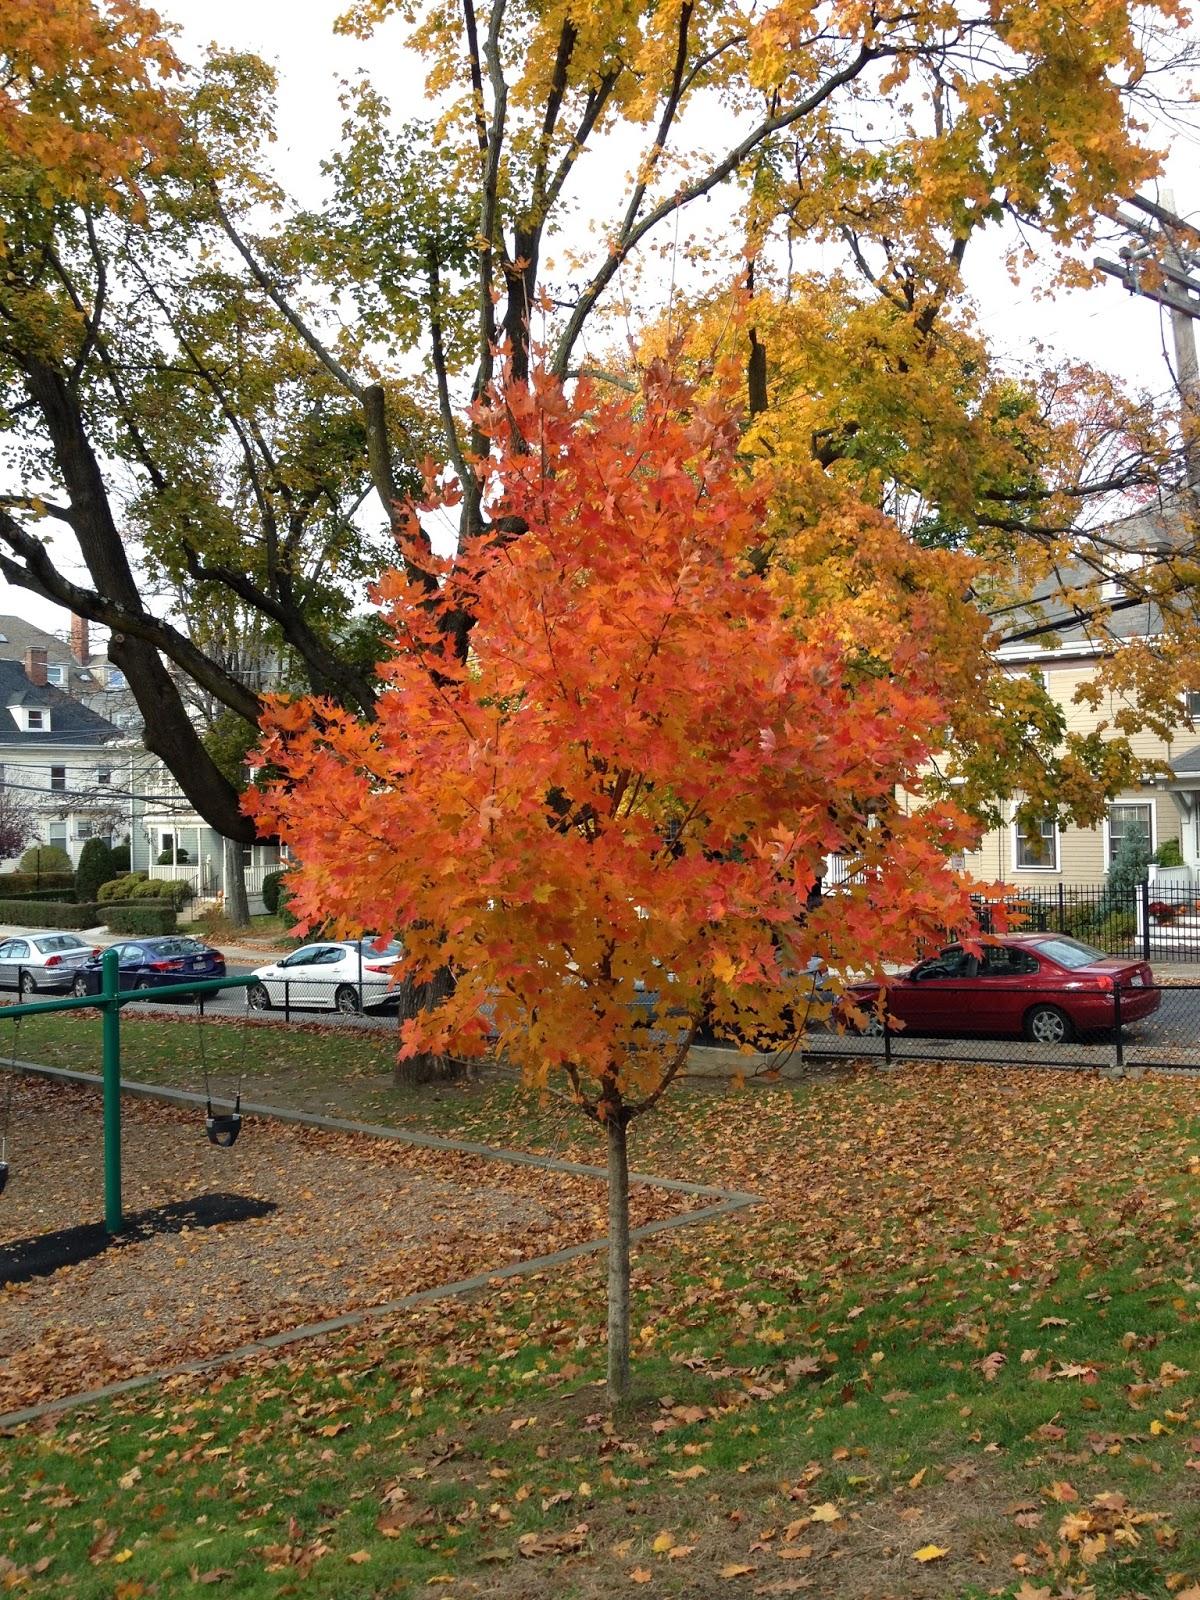 Best New England Fall Foliage